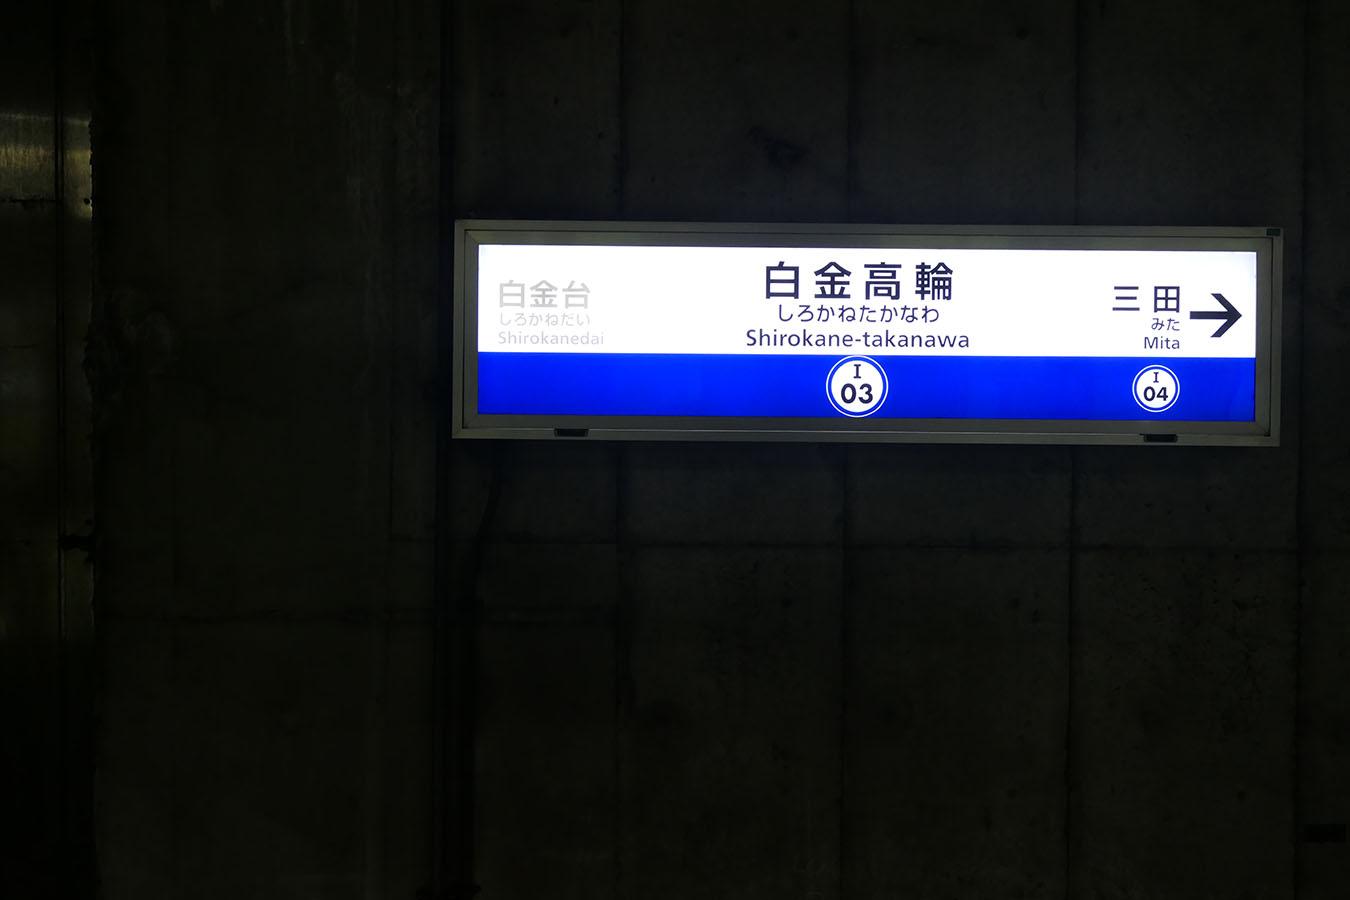 N03_photo05.jpg